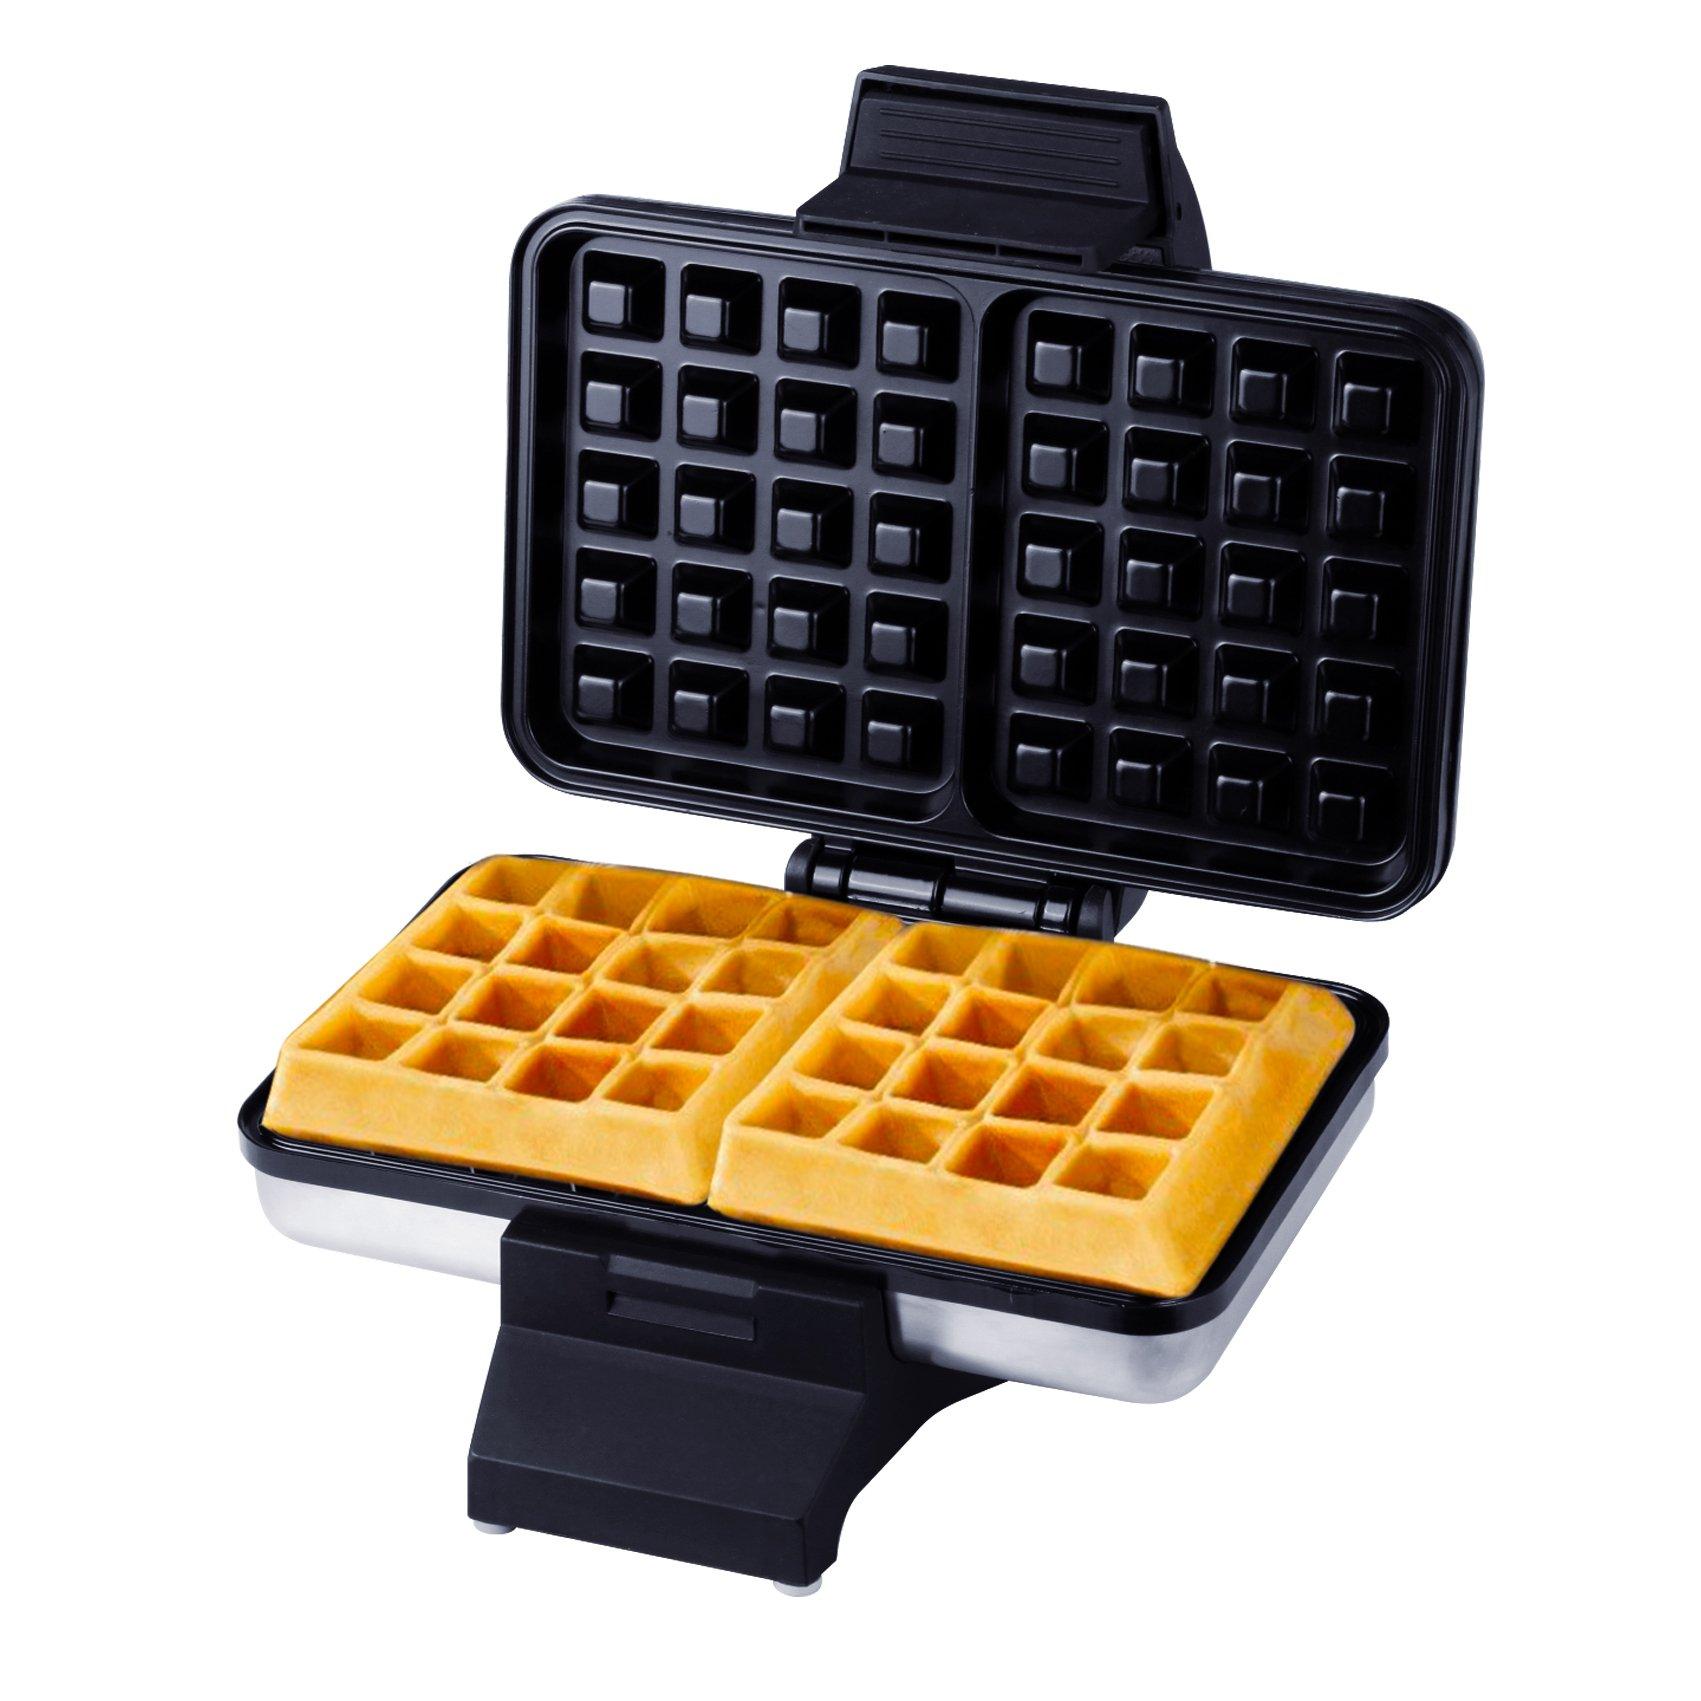 ZZ Breakfast Sandwich Maker with Sets of Detachable Non-stick Plate